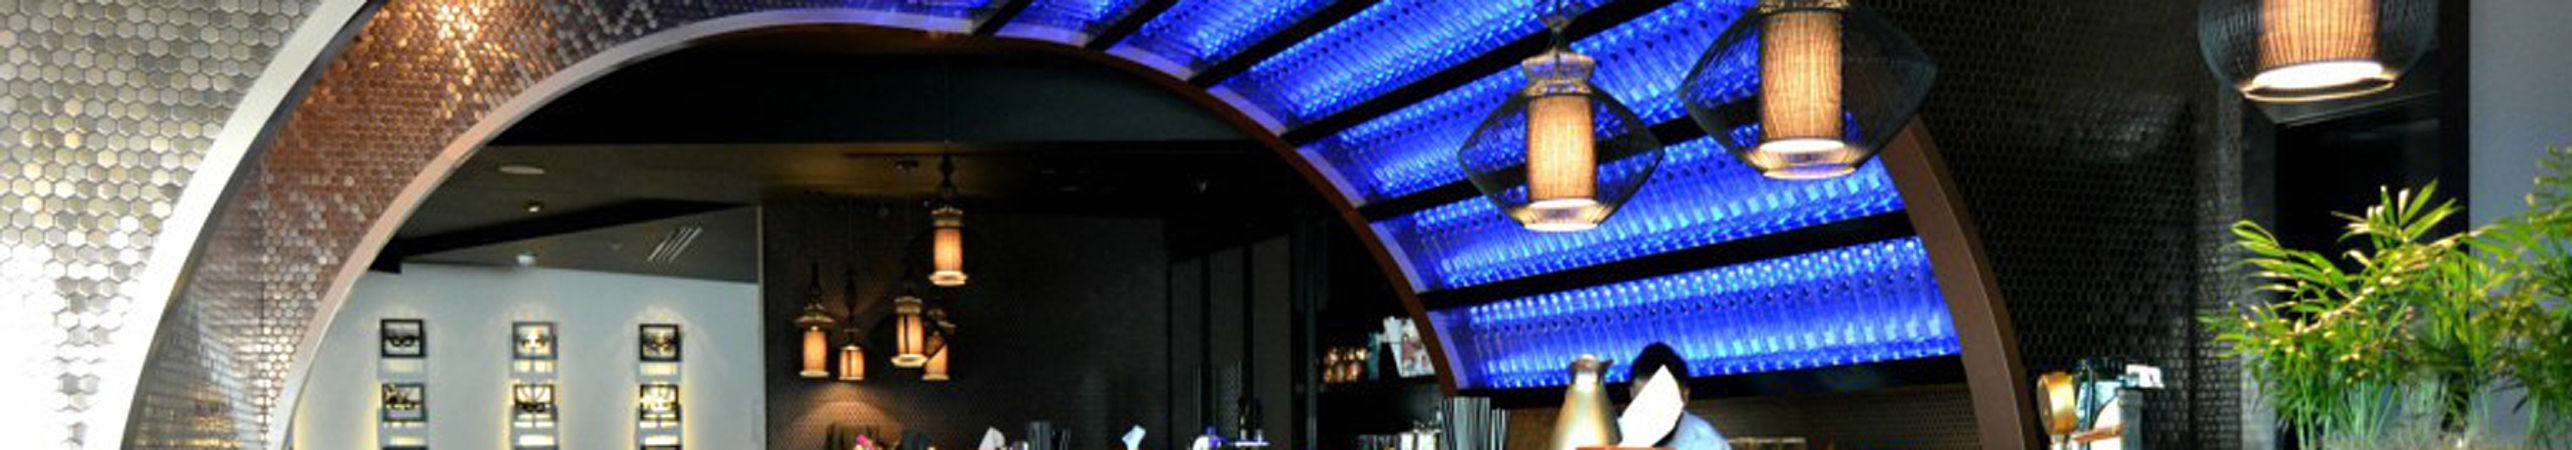 X-LED Lichtdesign Bar Dekoration Carnival by Tresind Dubai